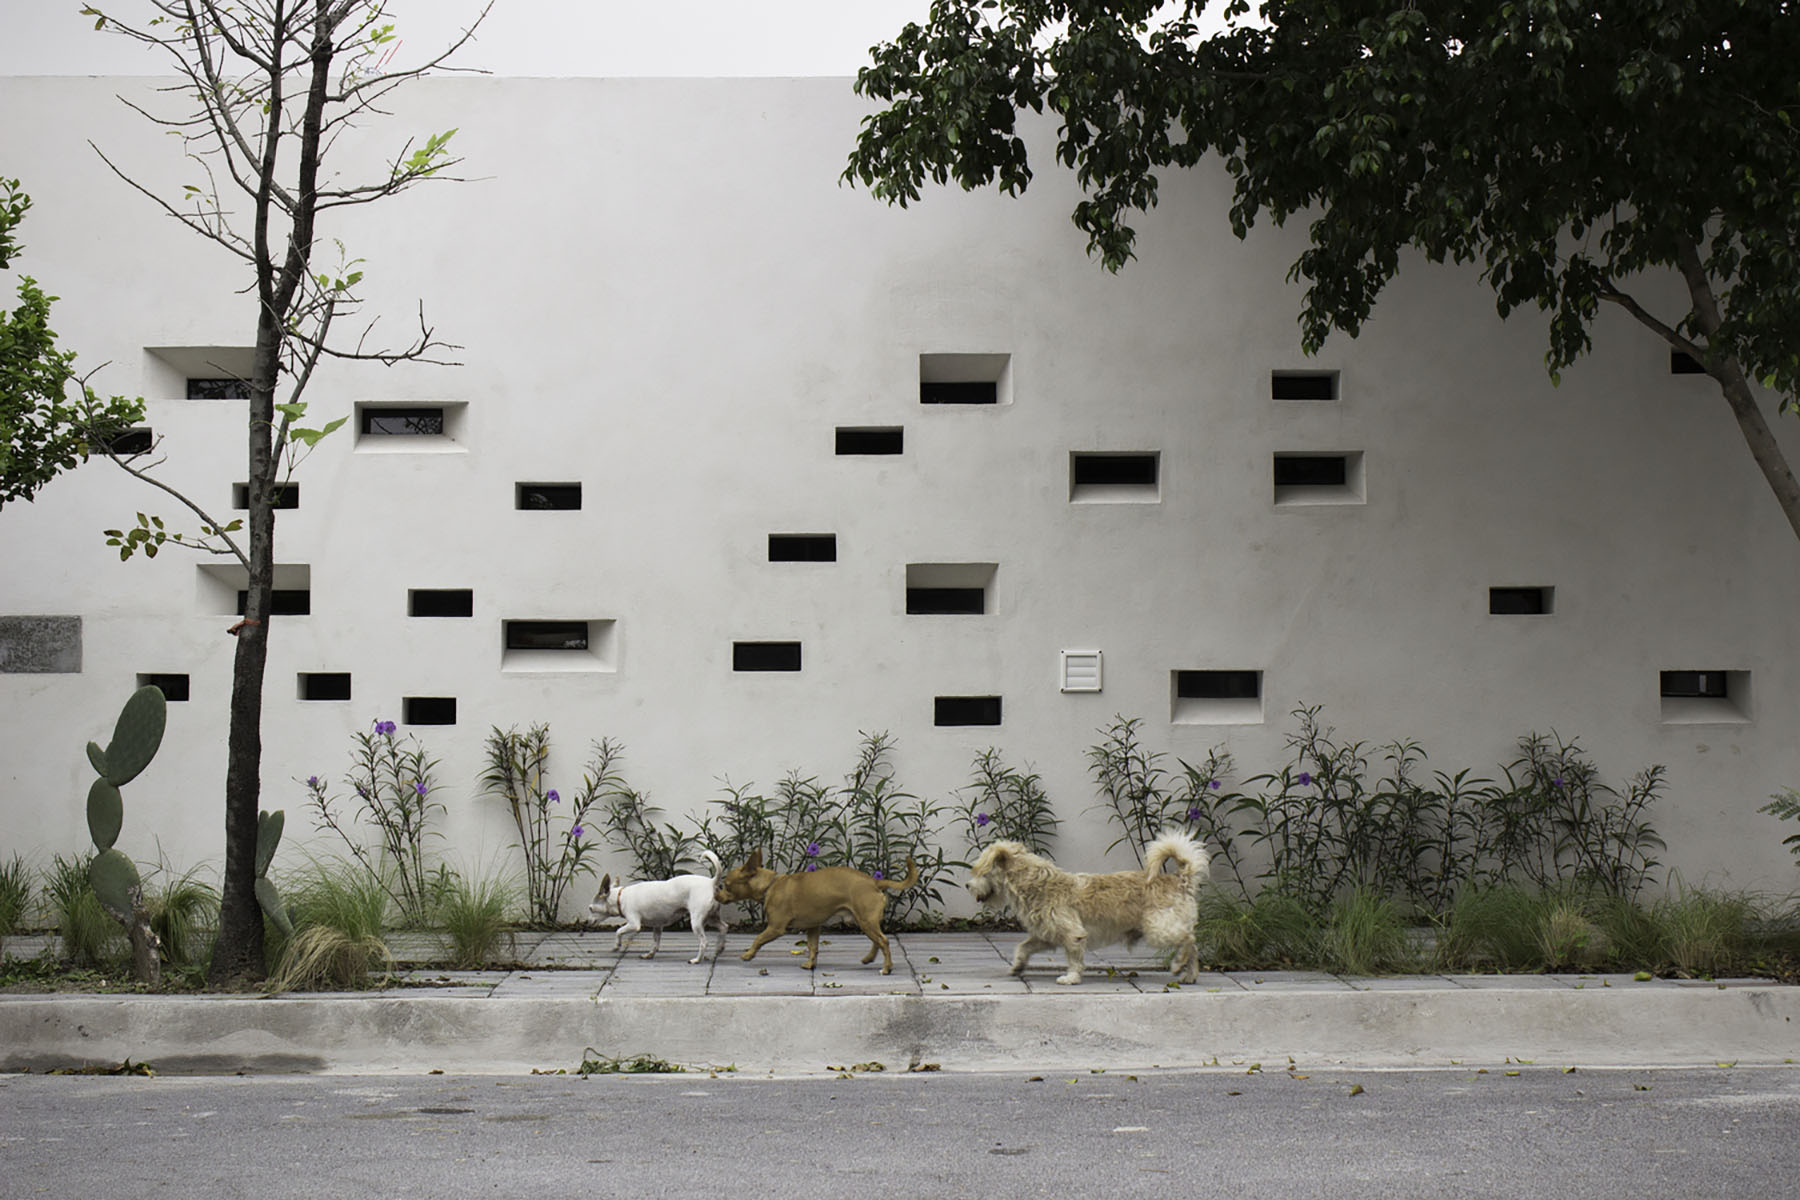 iGNANT-Architecture-Ariel-Valenzuela And-Diego-Ledesma -Casa-Papagayo-F